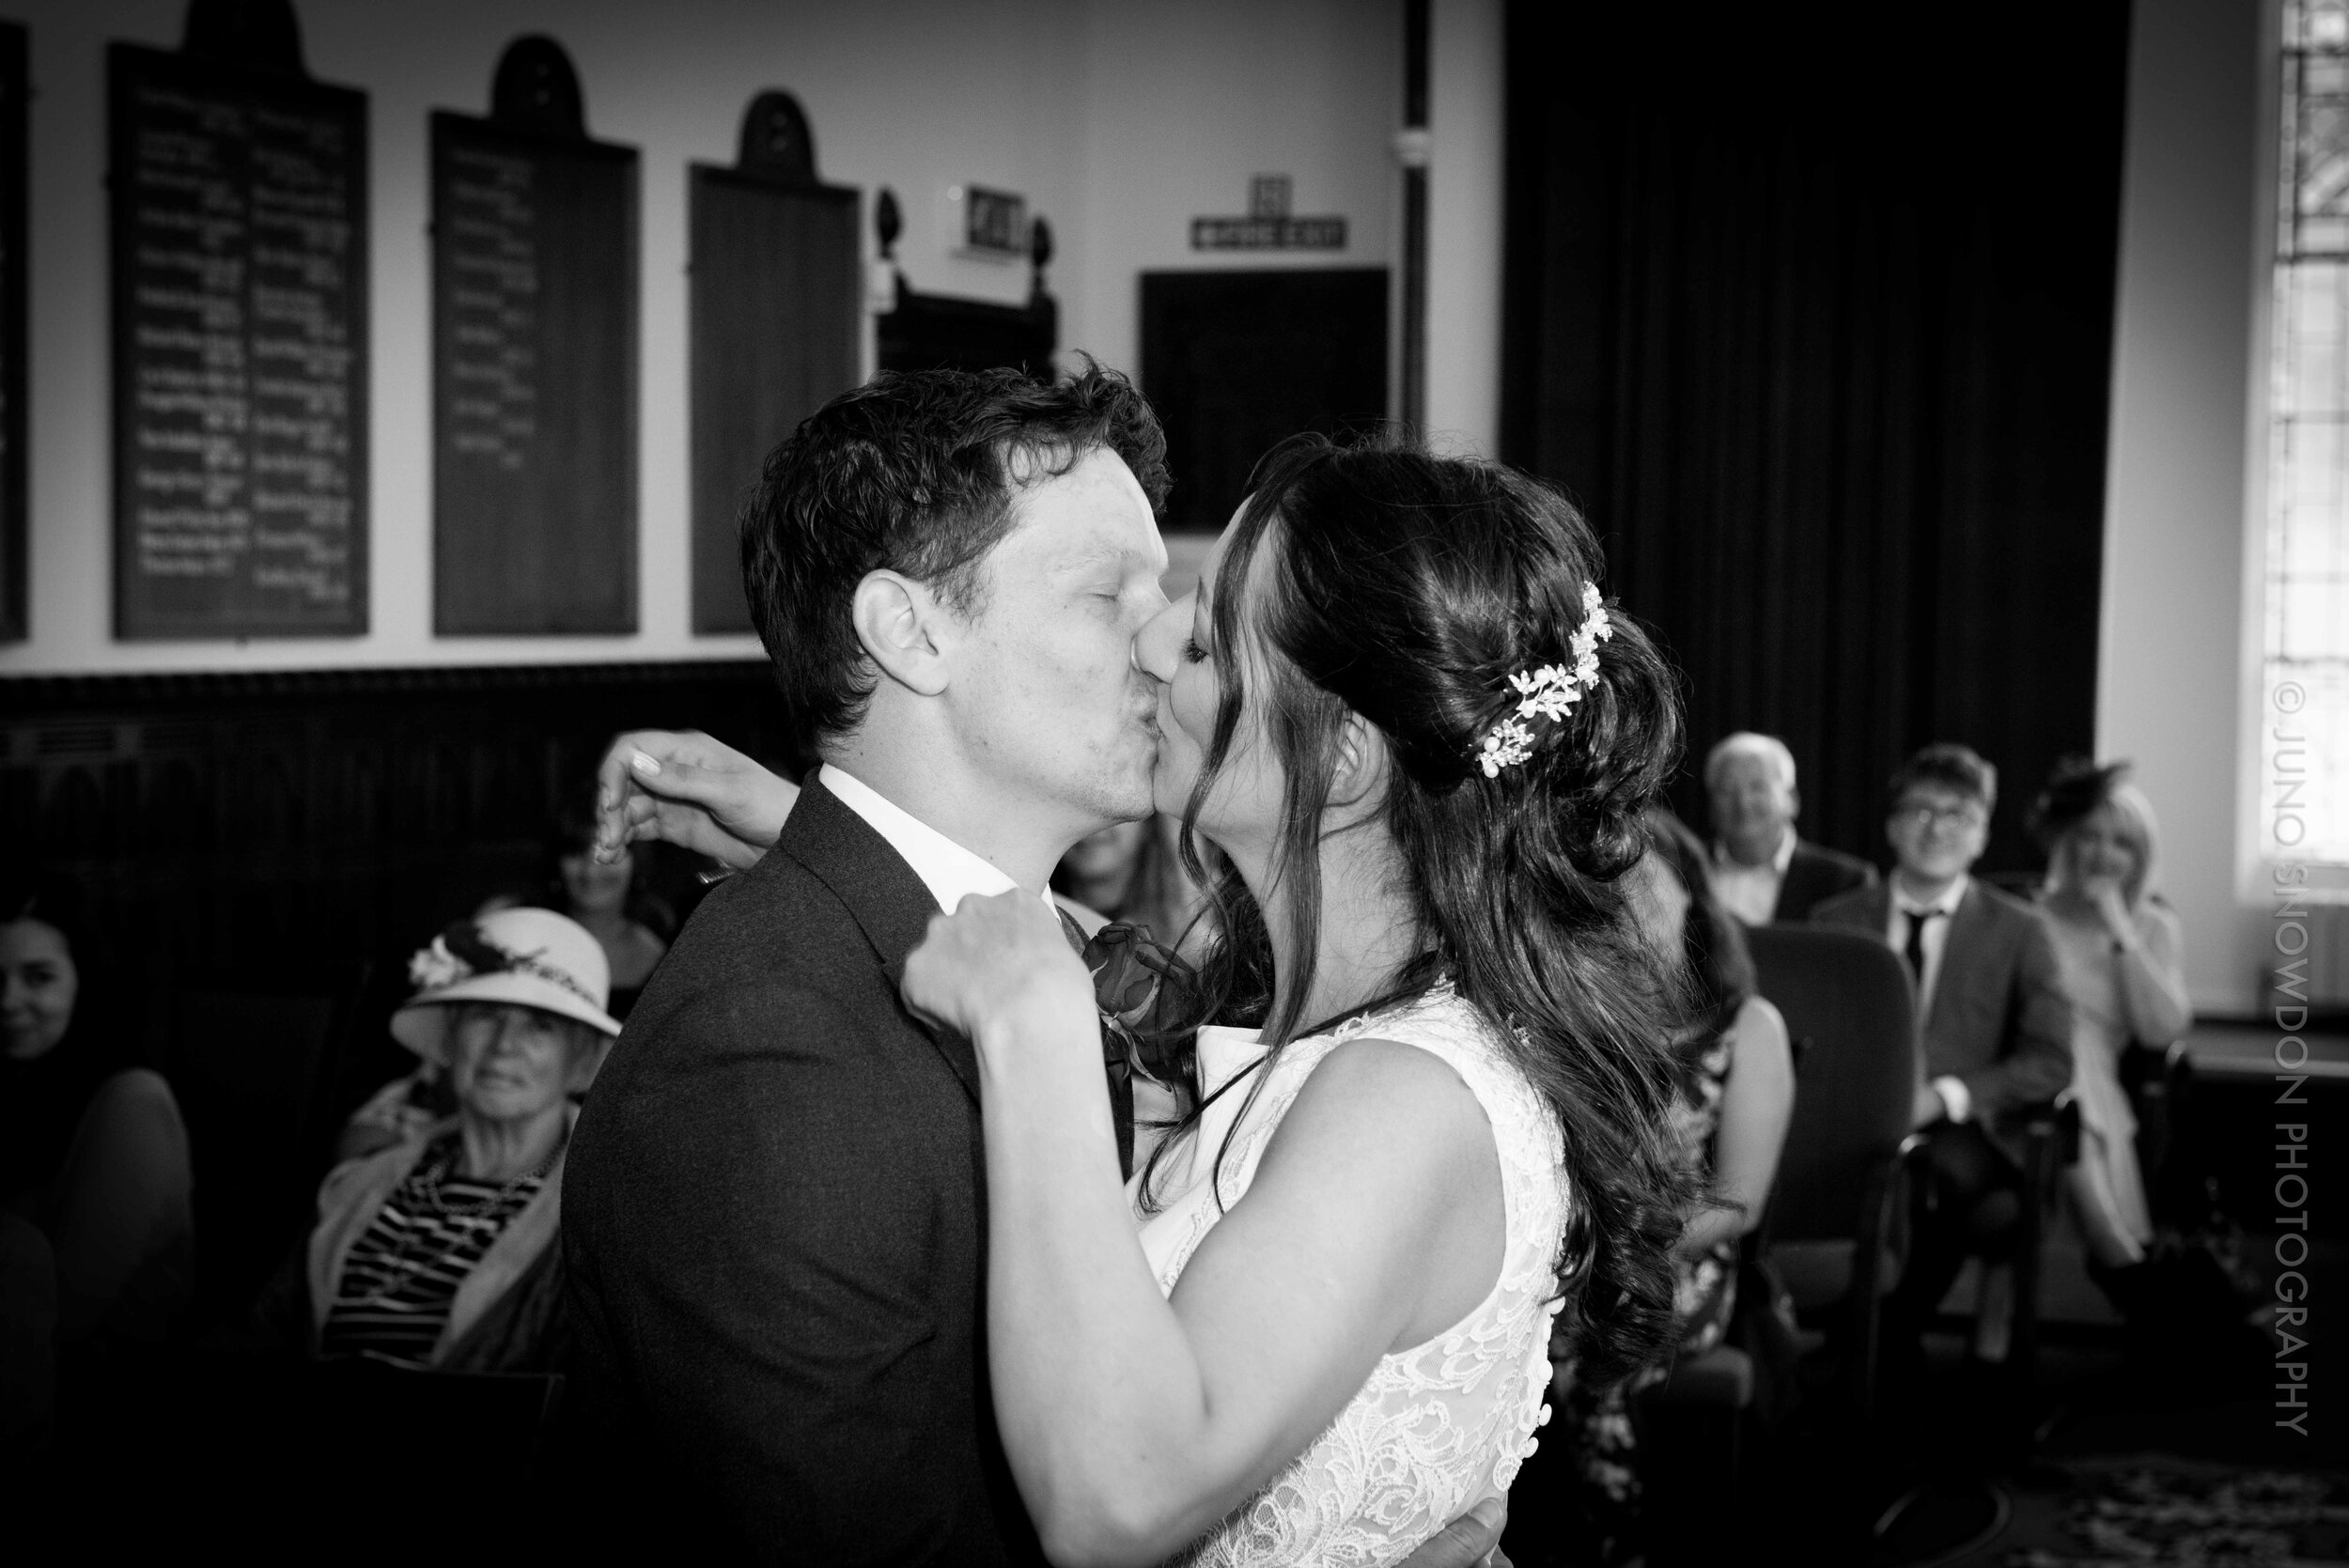 juno-snowdon-photography-wedding-7285.jpg